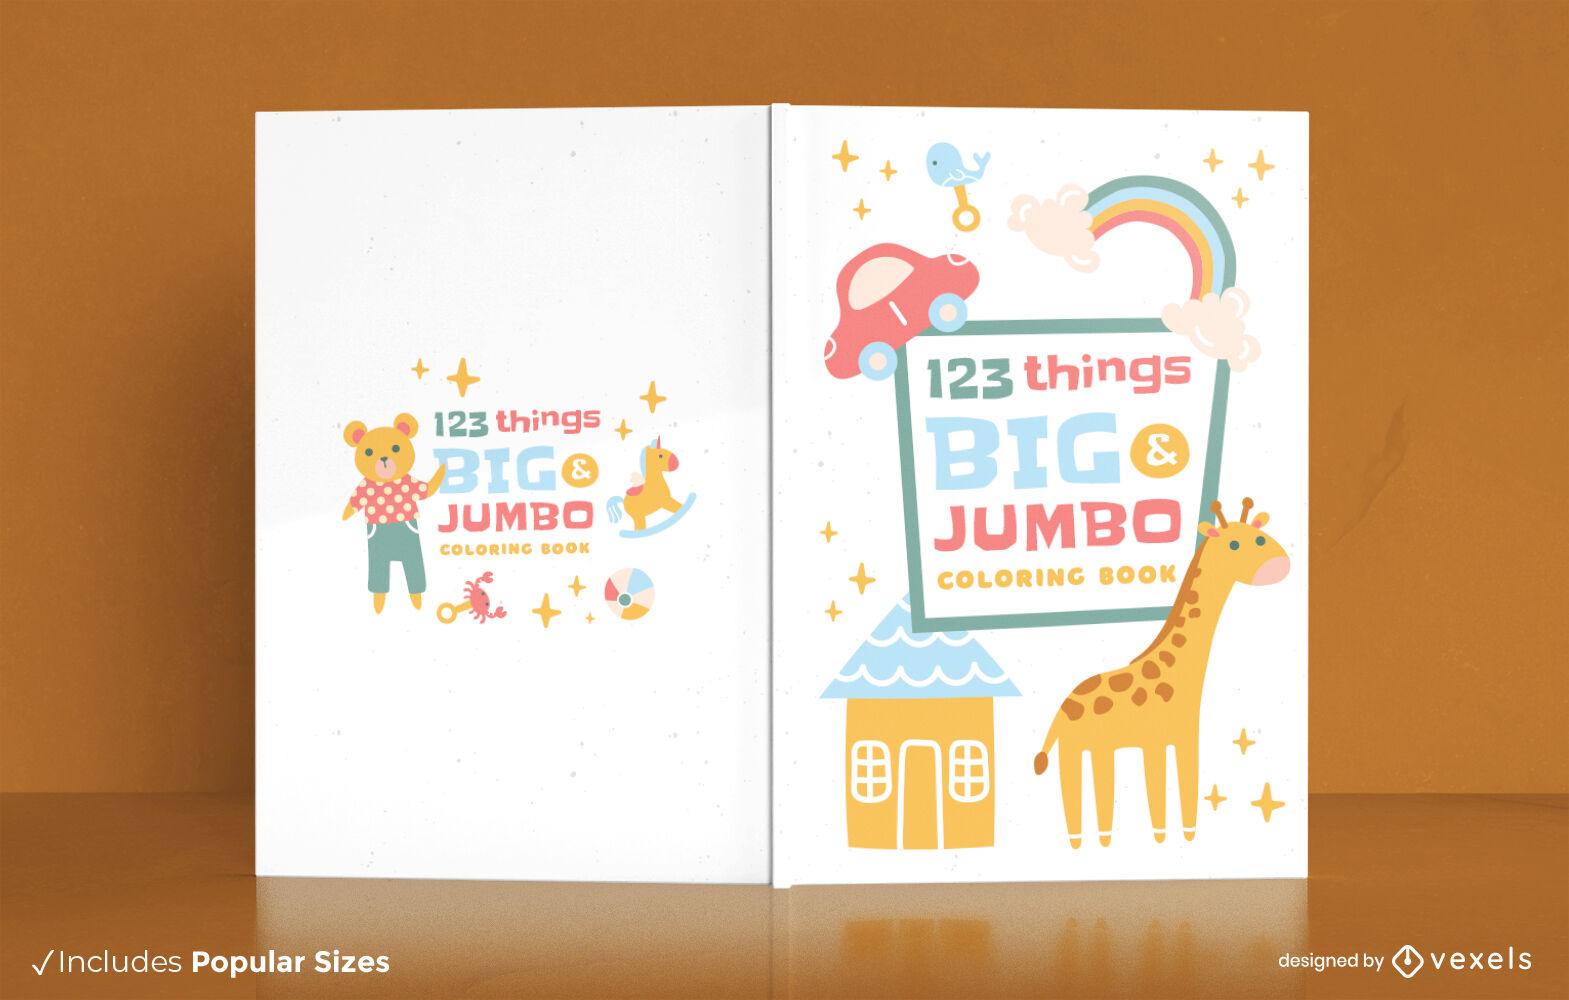 Children's coloring book cover design